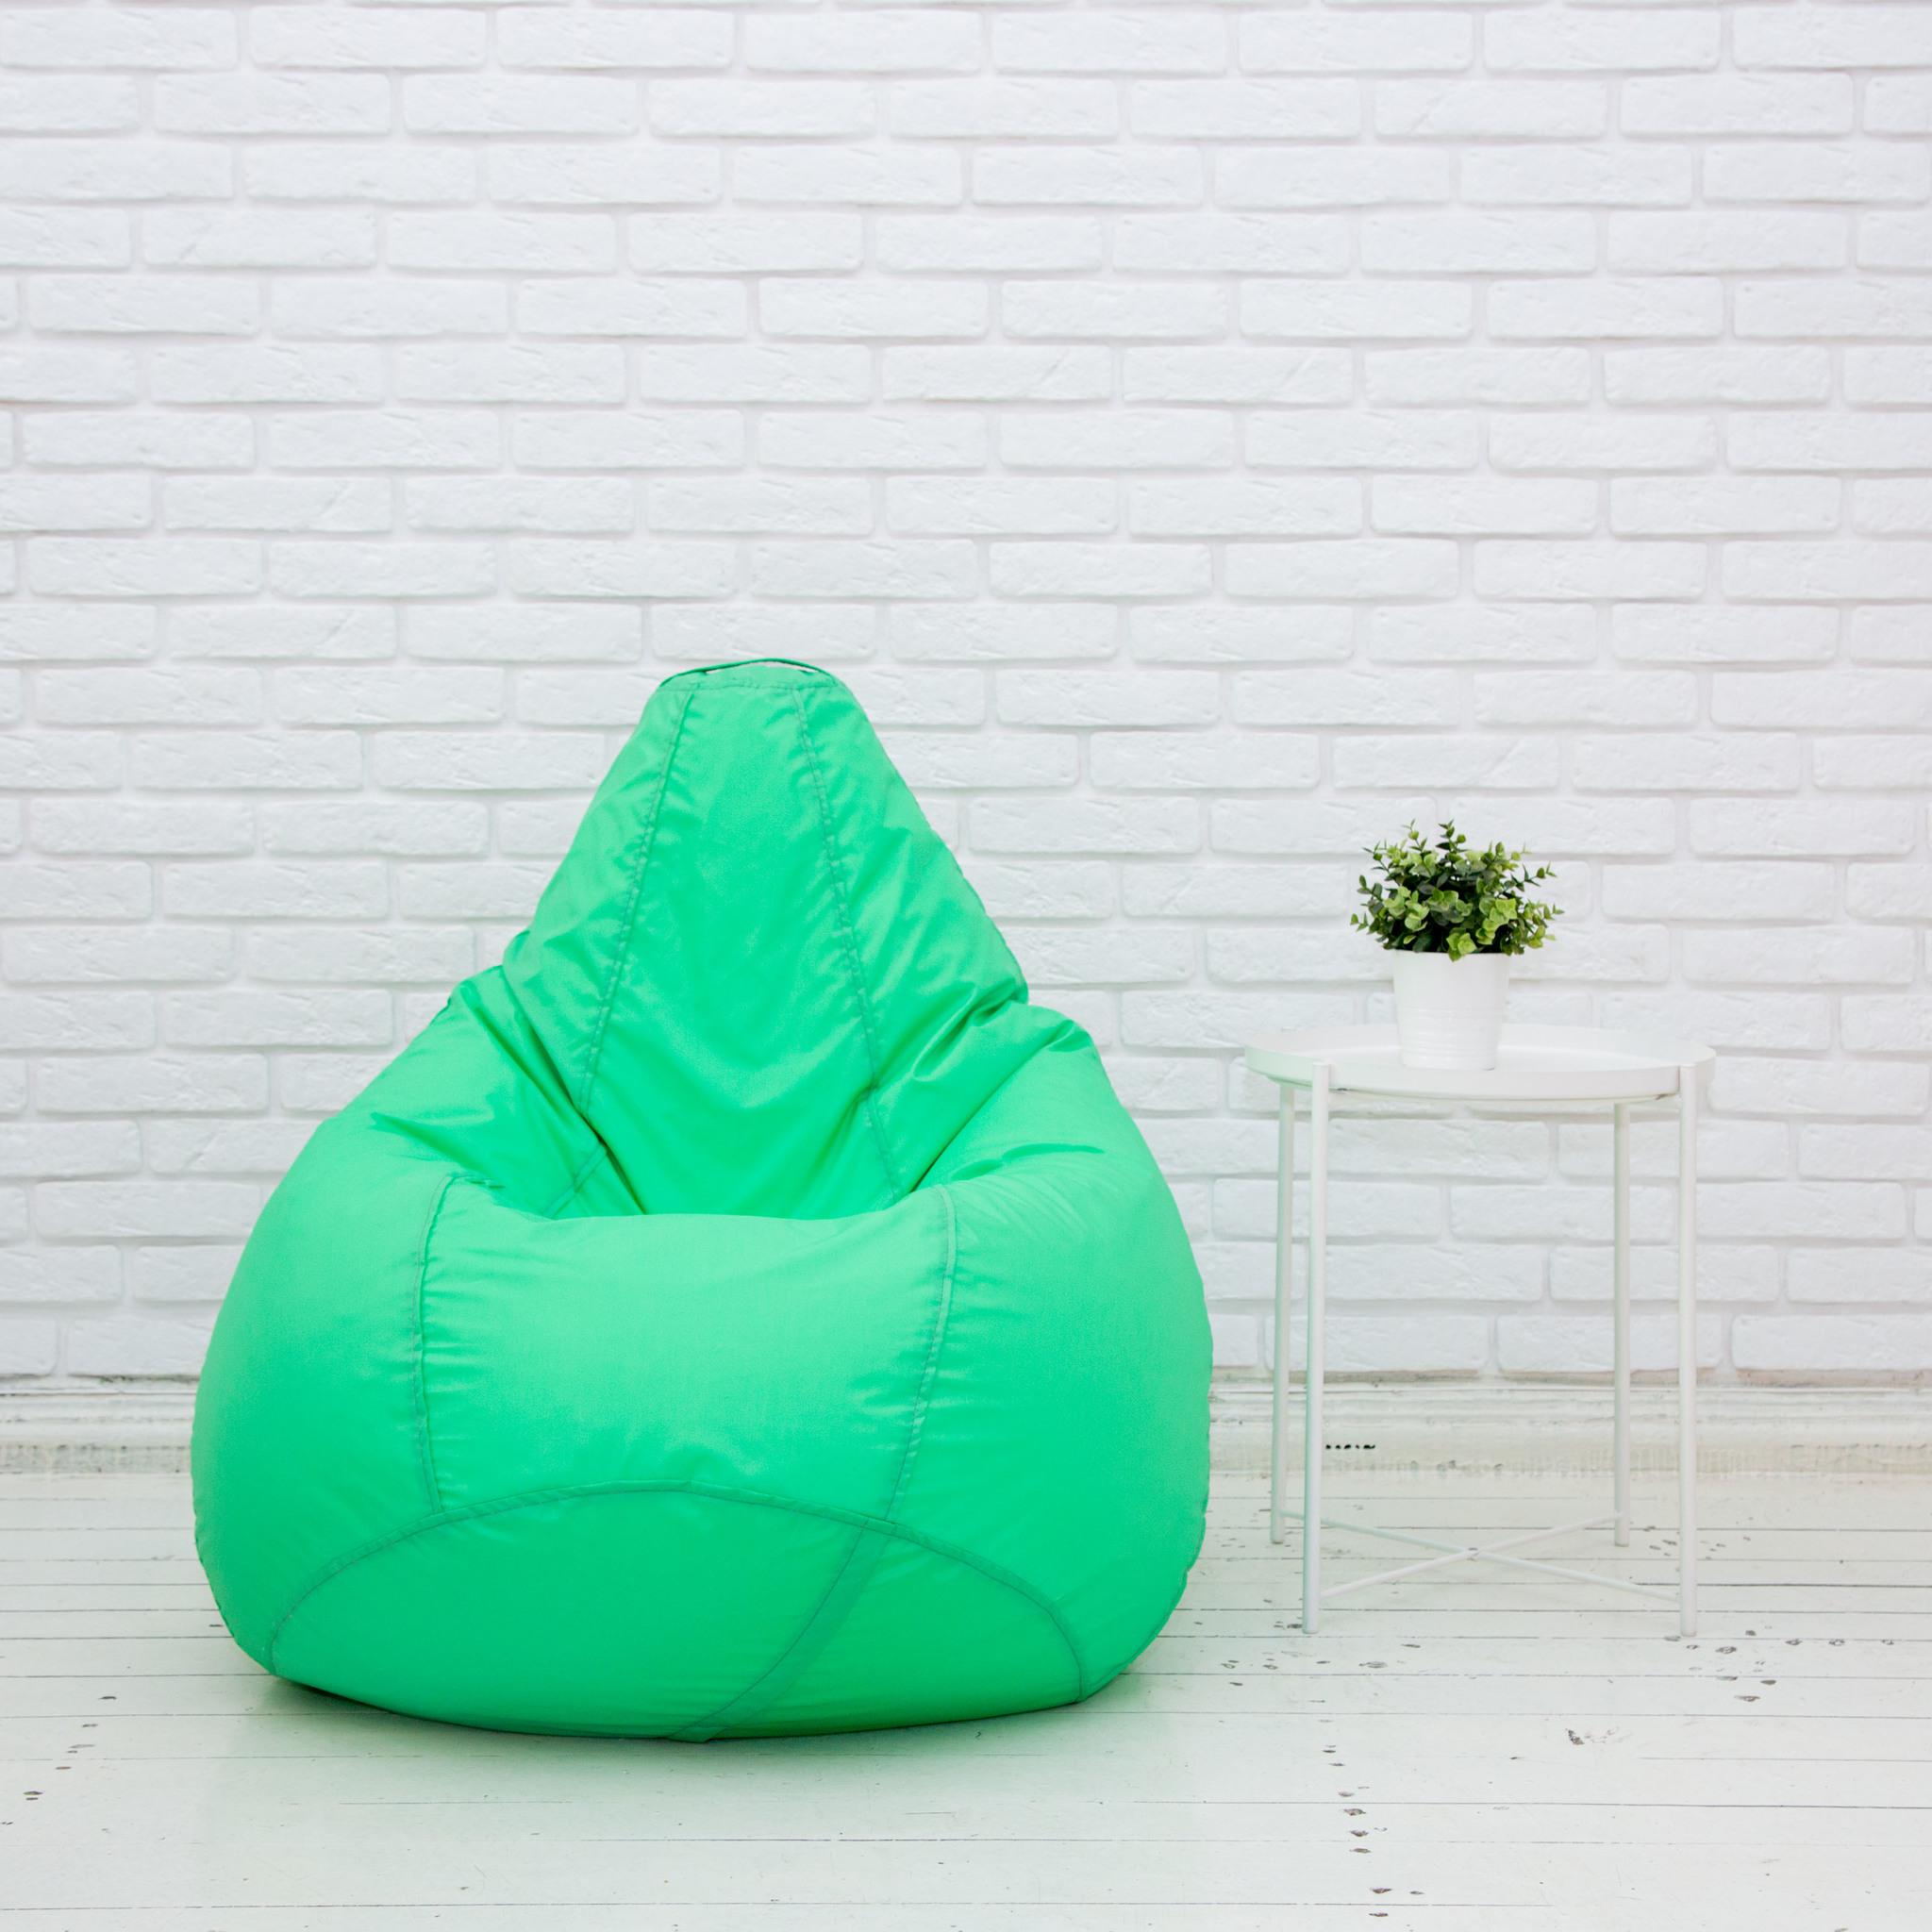 Груша М плащёвка, съёмный чехол (зелёный)